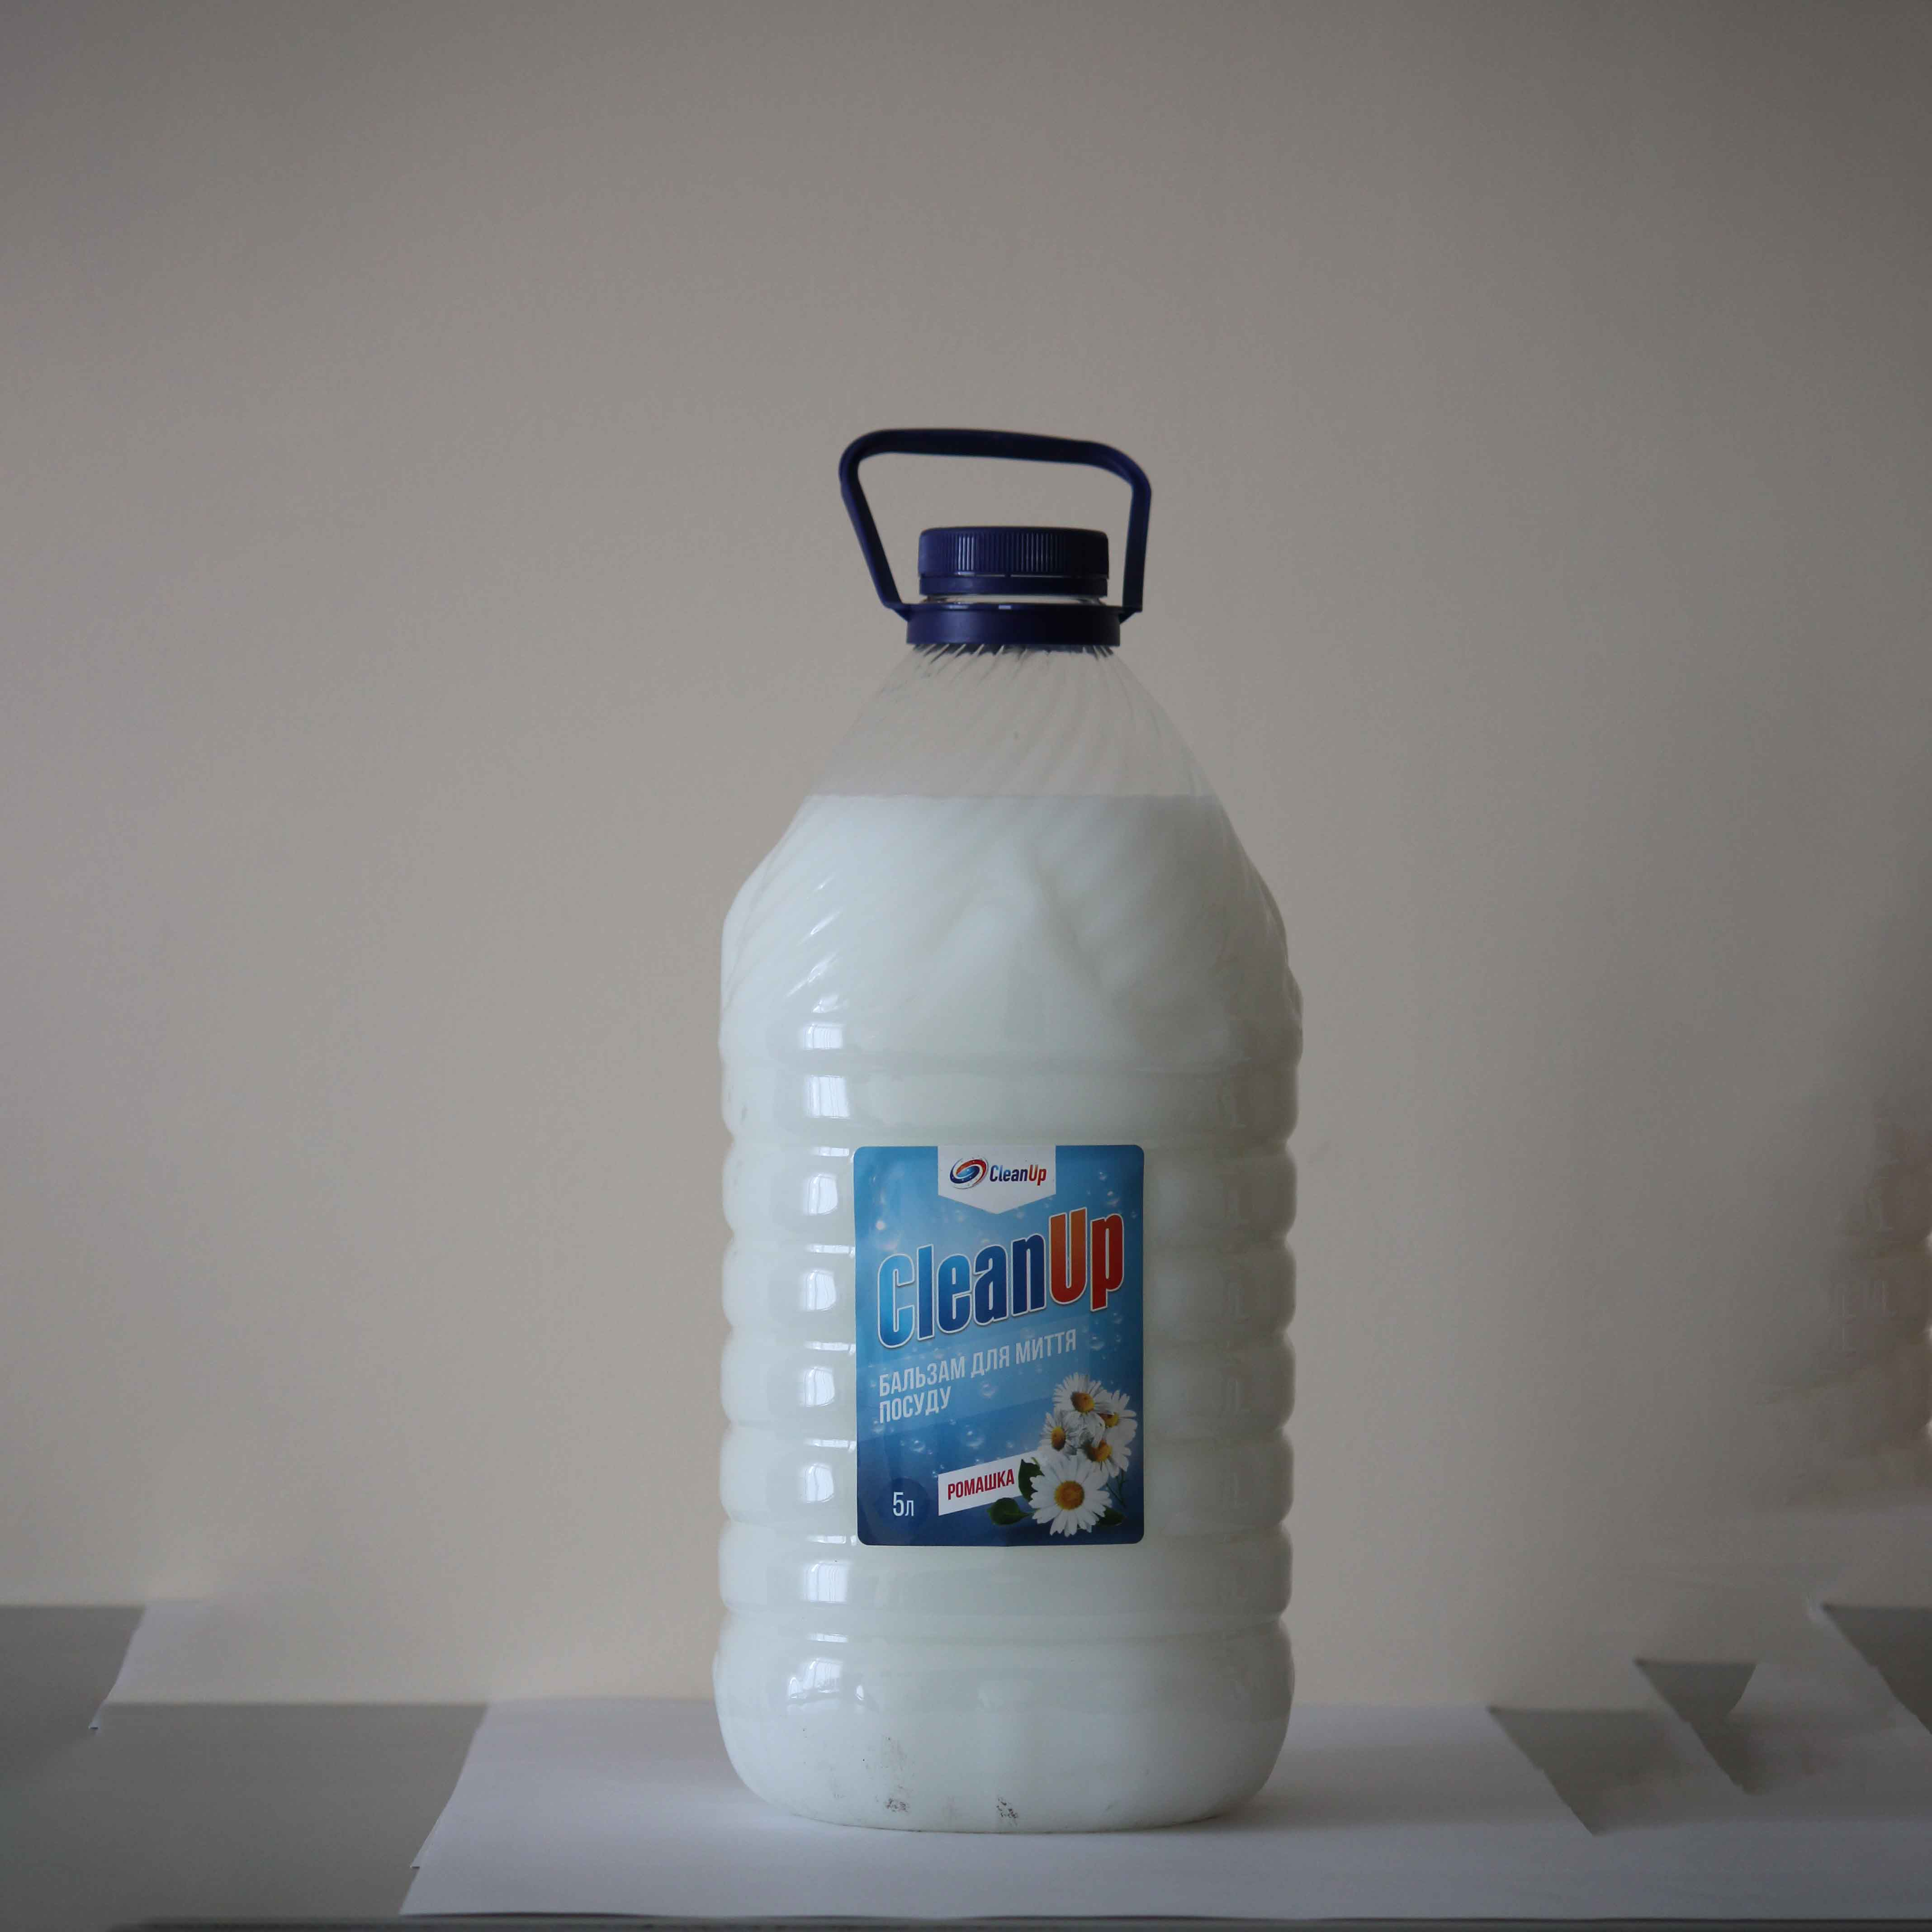 Clean Up Бальзам Ромашка пет пляшка д/м посуду 5л